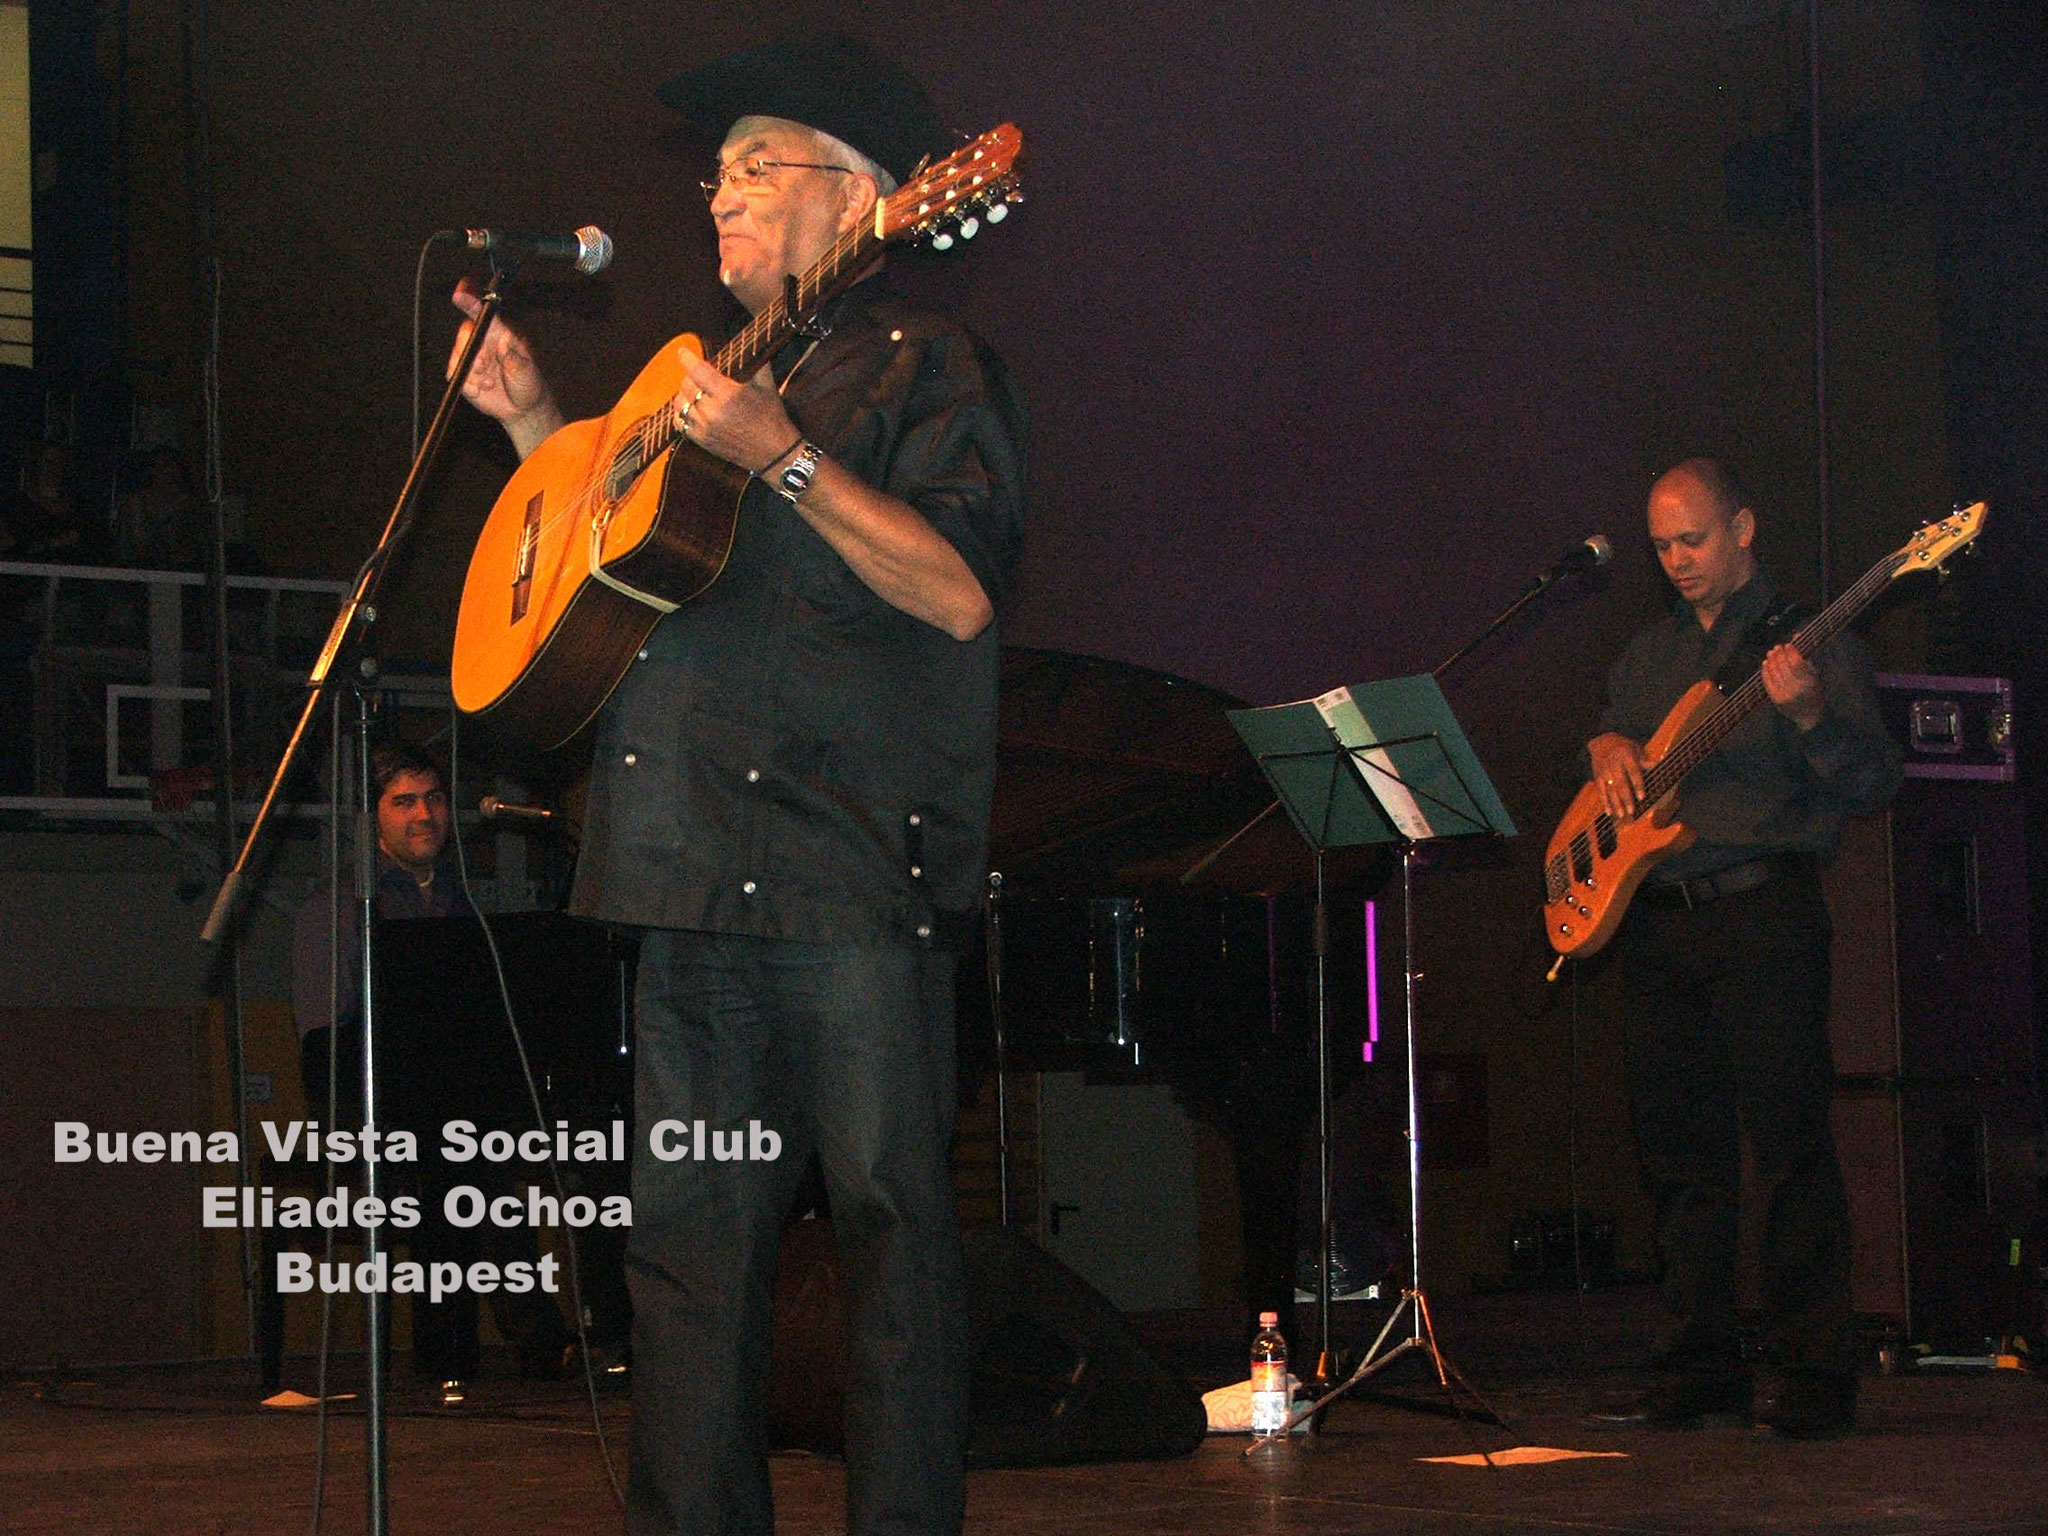 Buena Vista Social Club (Budapest 2005)  - Raimundo Nieves